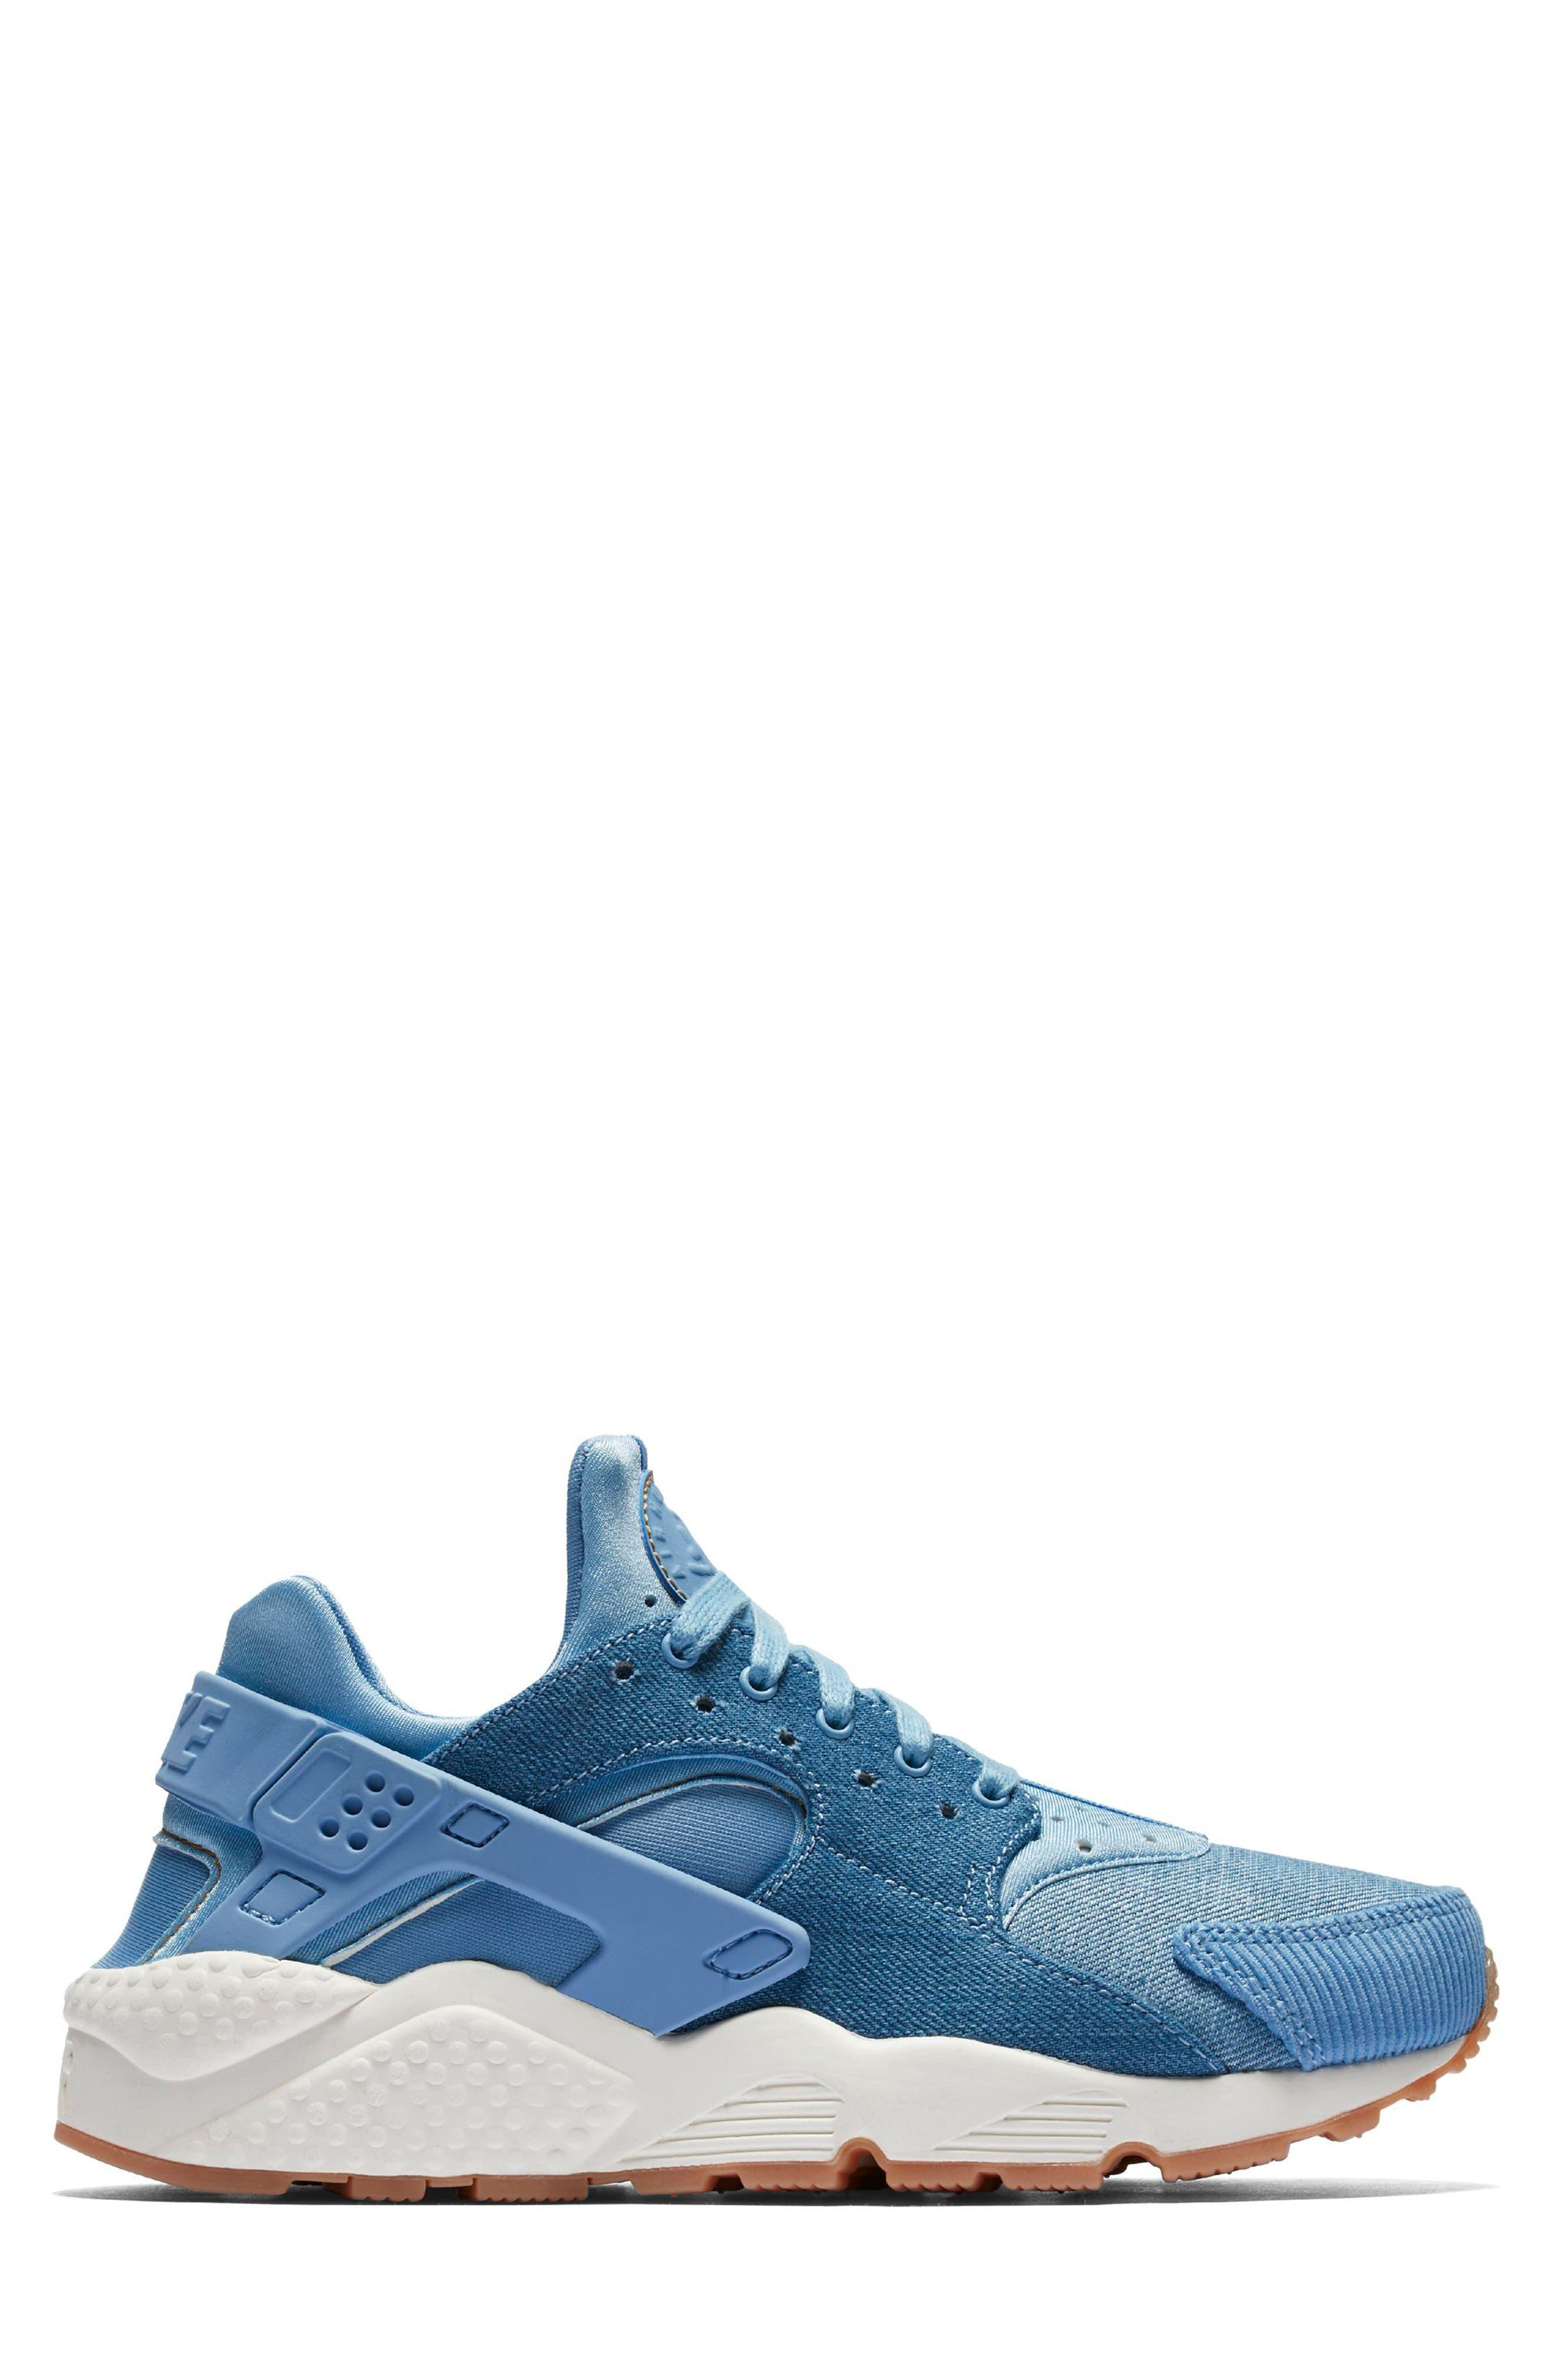 Main Image - Nike Air Huarache Run SE Sneaker (Women)